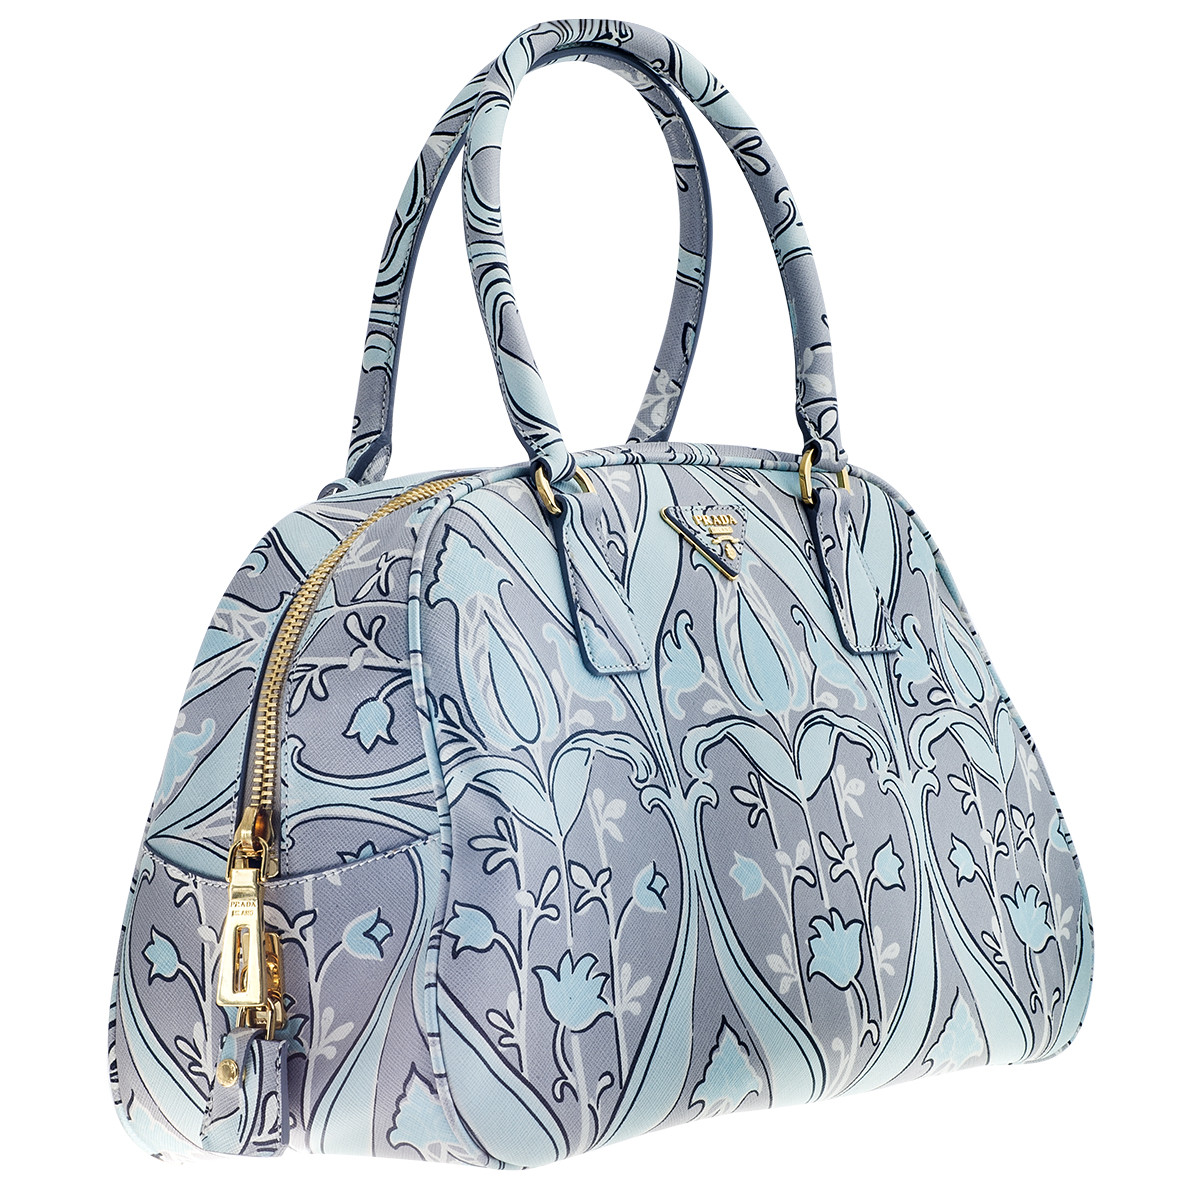 Vintage Prada Handbag with Saffiano Anis Floral Print